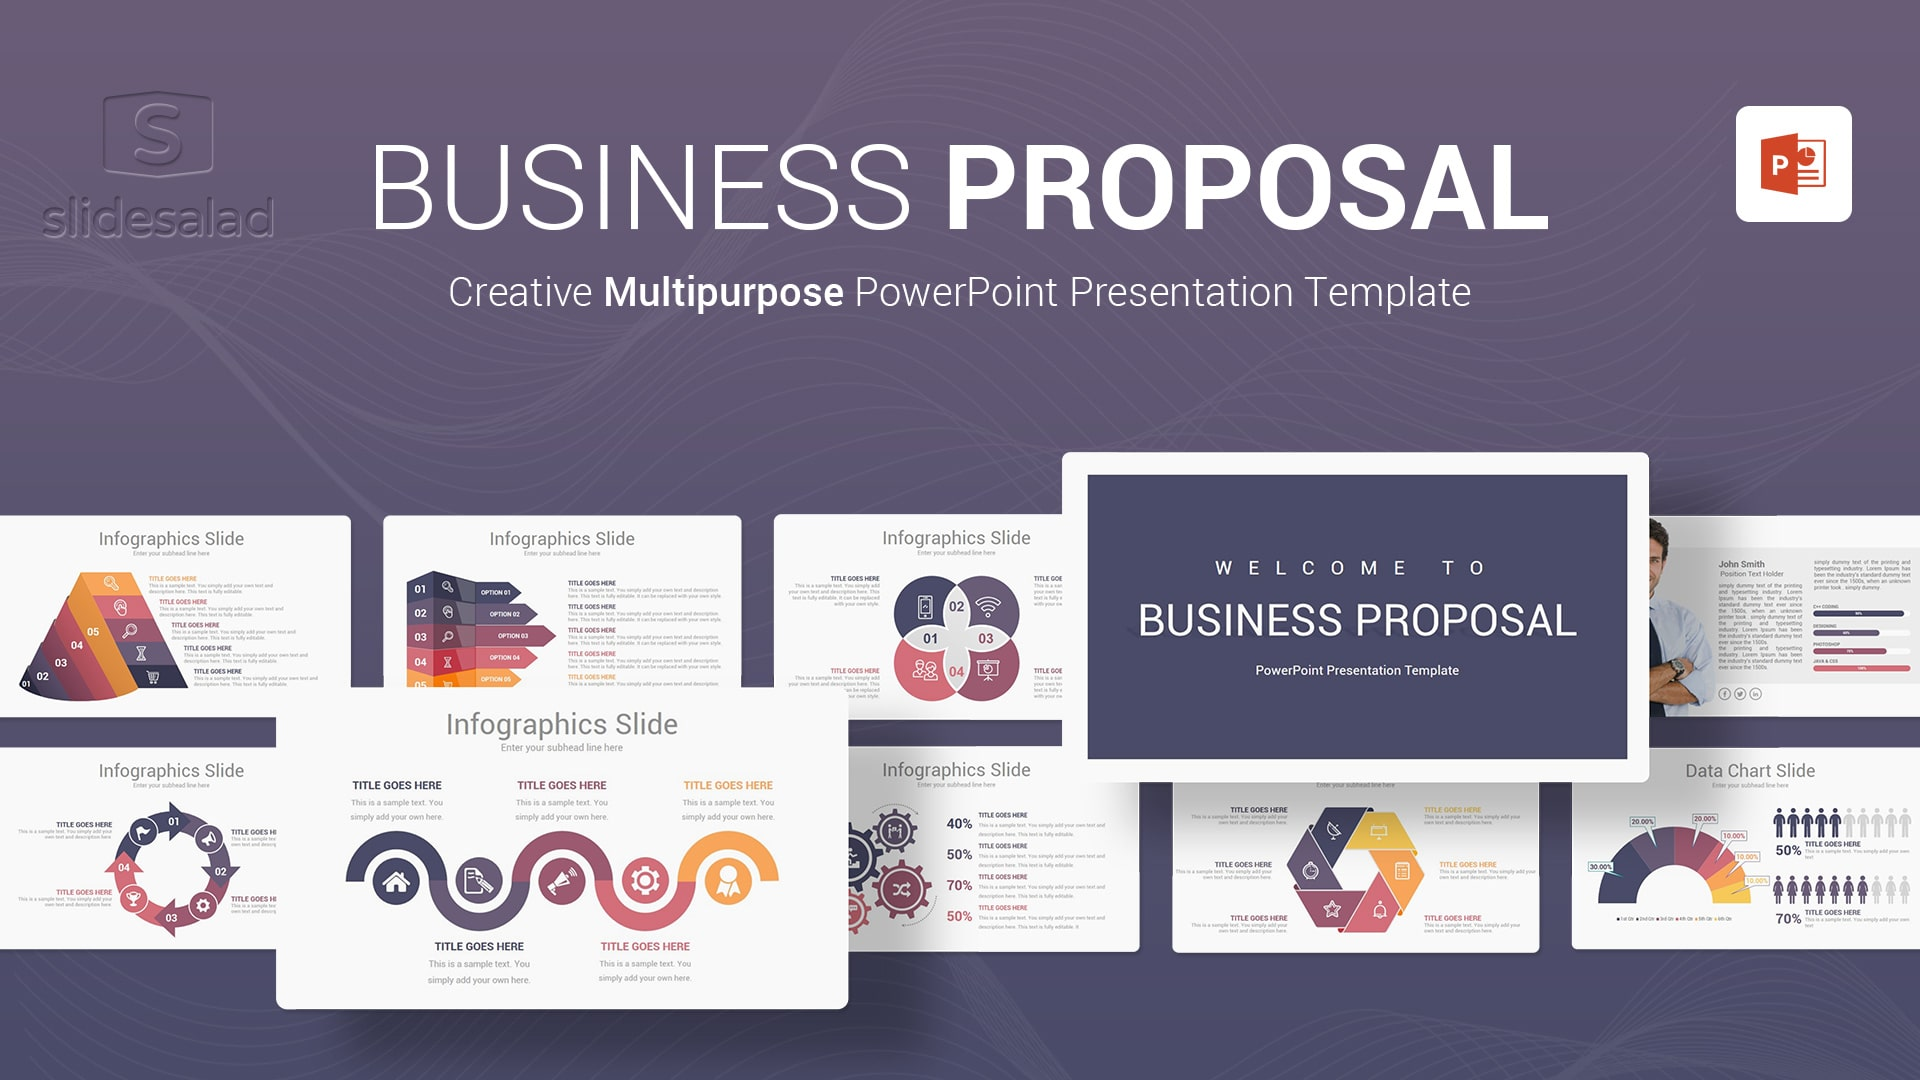 Business Proposal PowerPoint Presentation Template - Business Pitch Deck PowerPoint Proposal Template